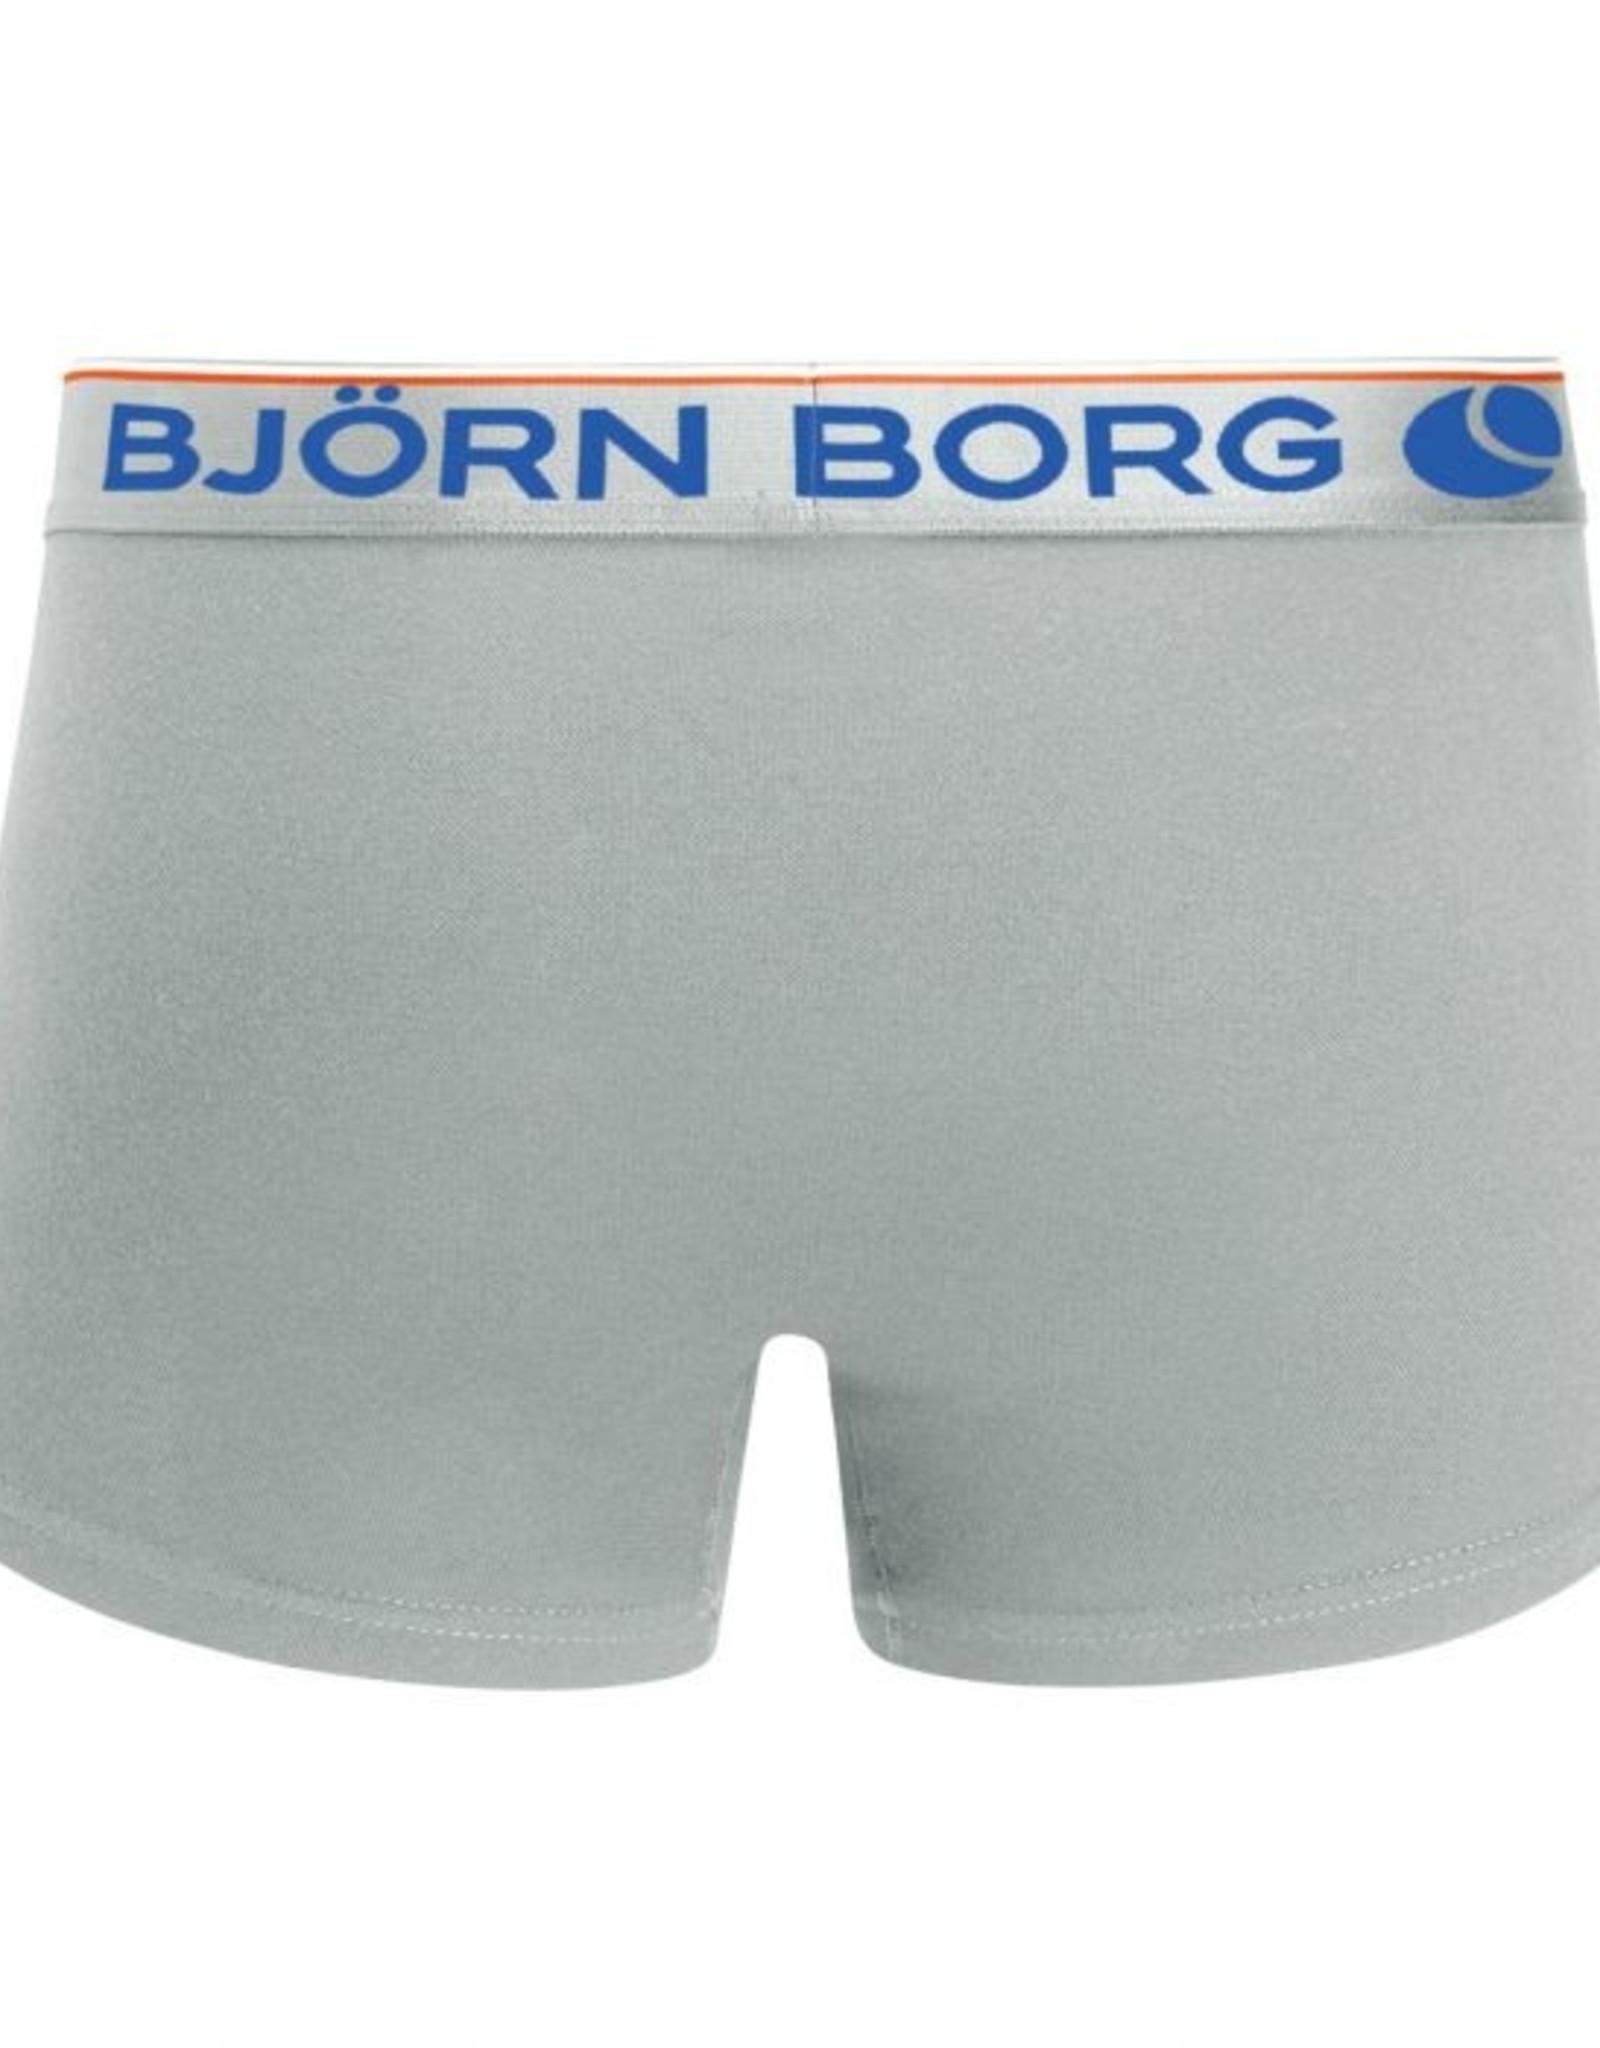 Bjorn Borg Boxershort 2-pack Running